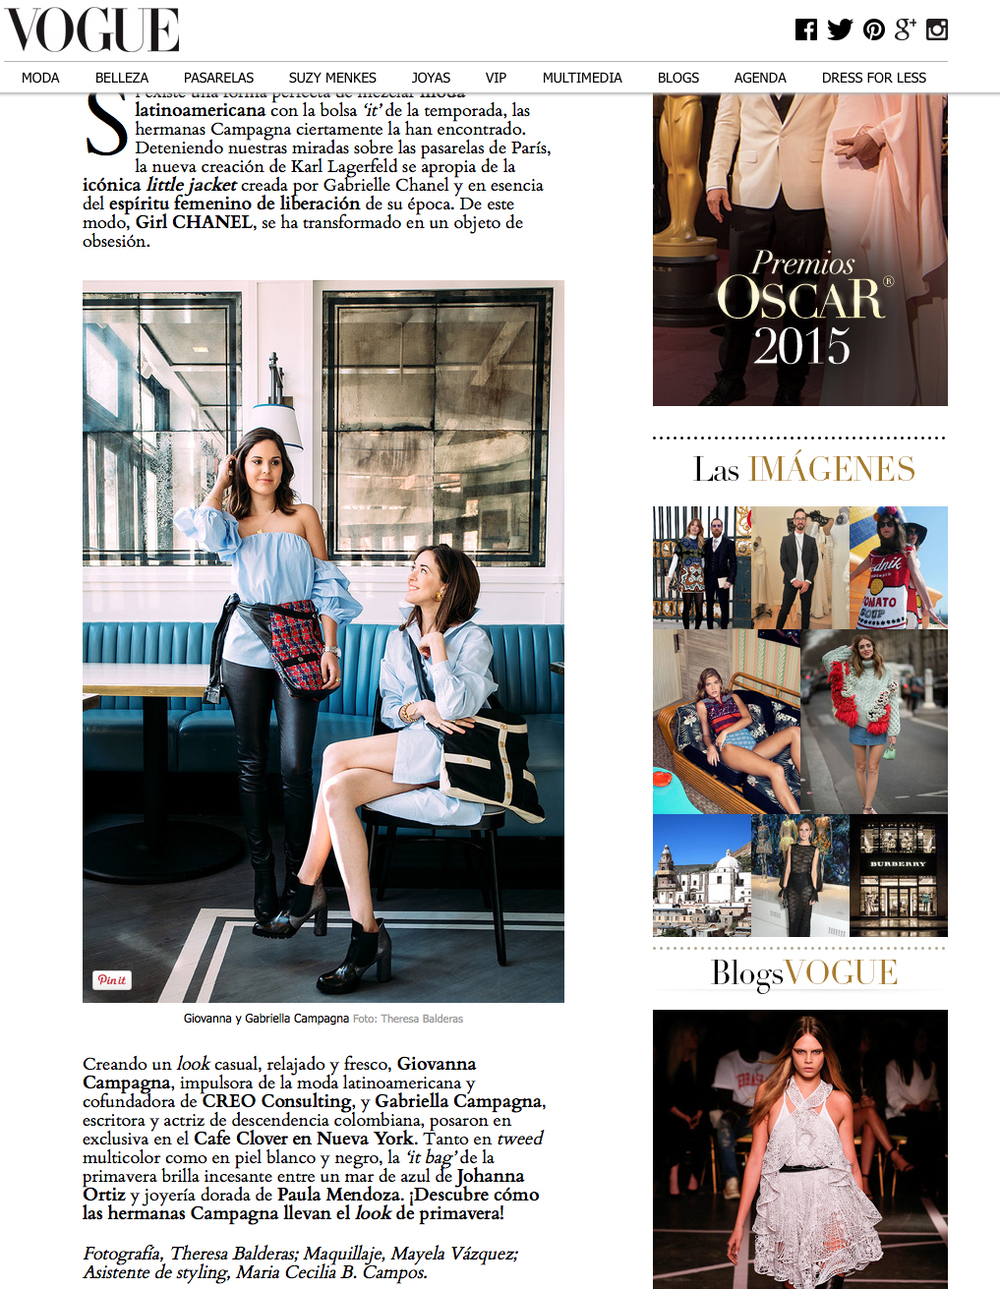 Mayela-Vazquez-Press-6.jpg